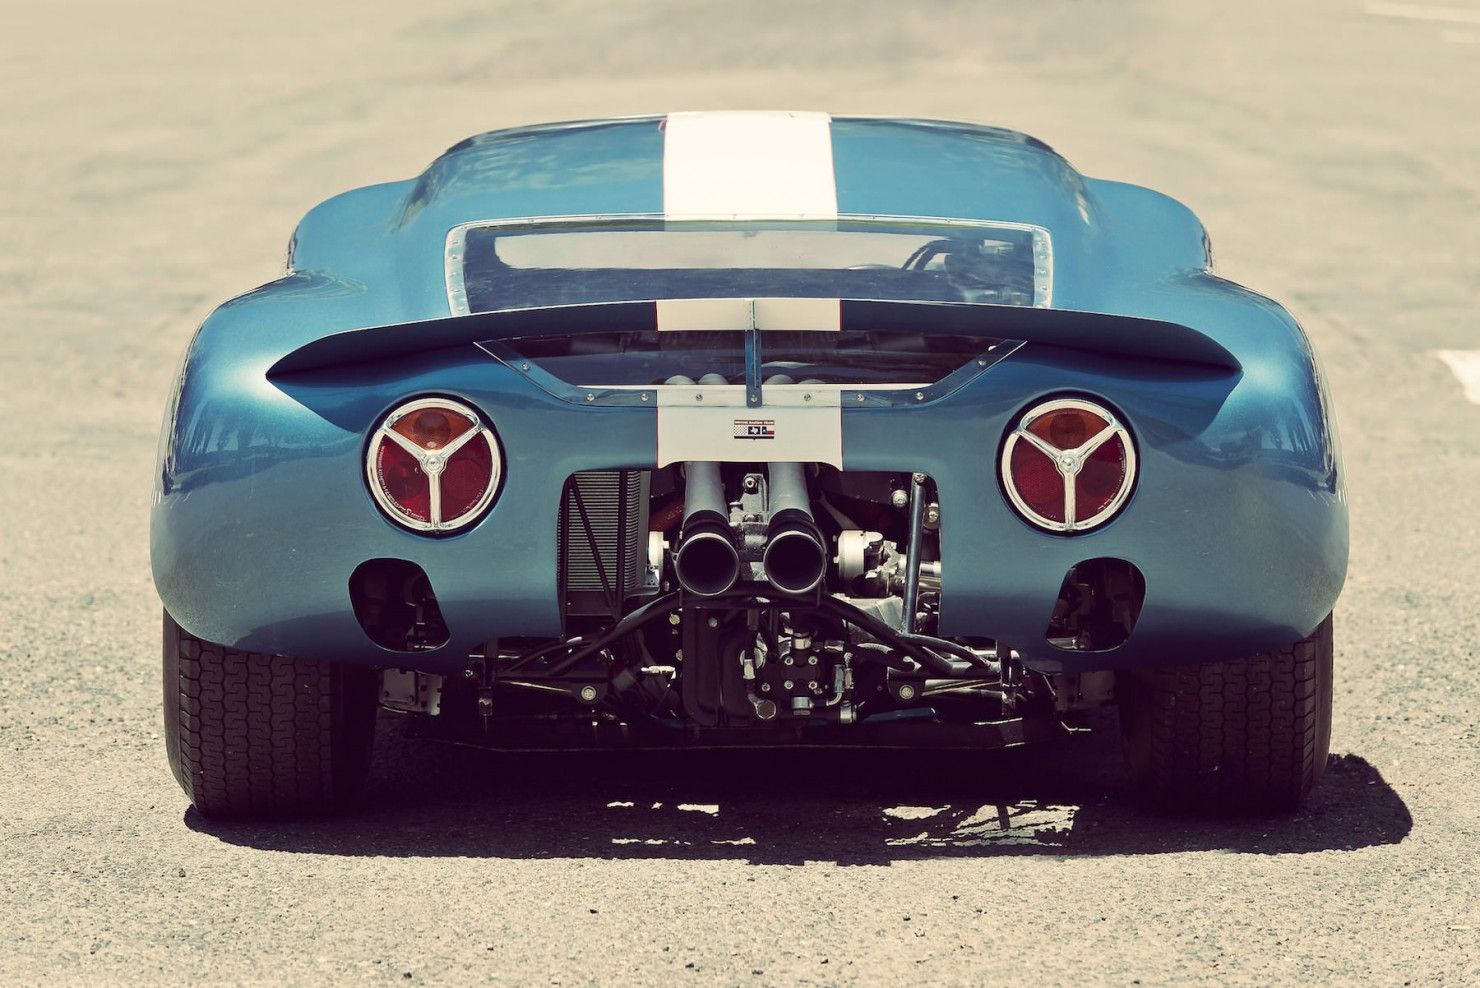 1963 Lola Mk6 Gt Gt Cars Cool Cars Vintage Race Car